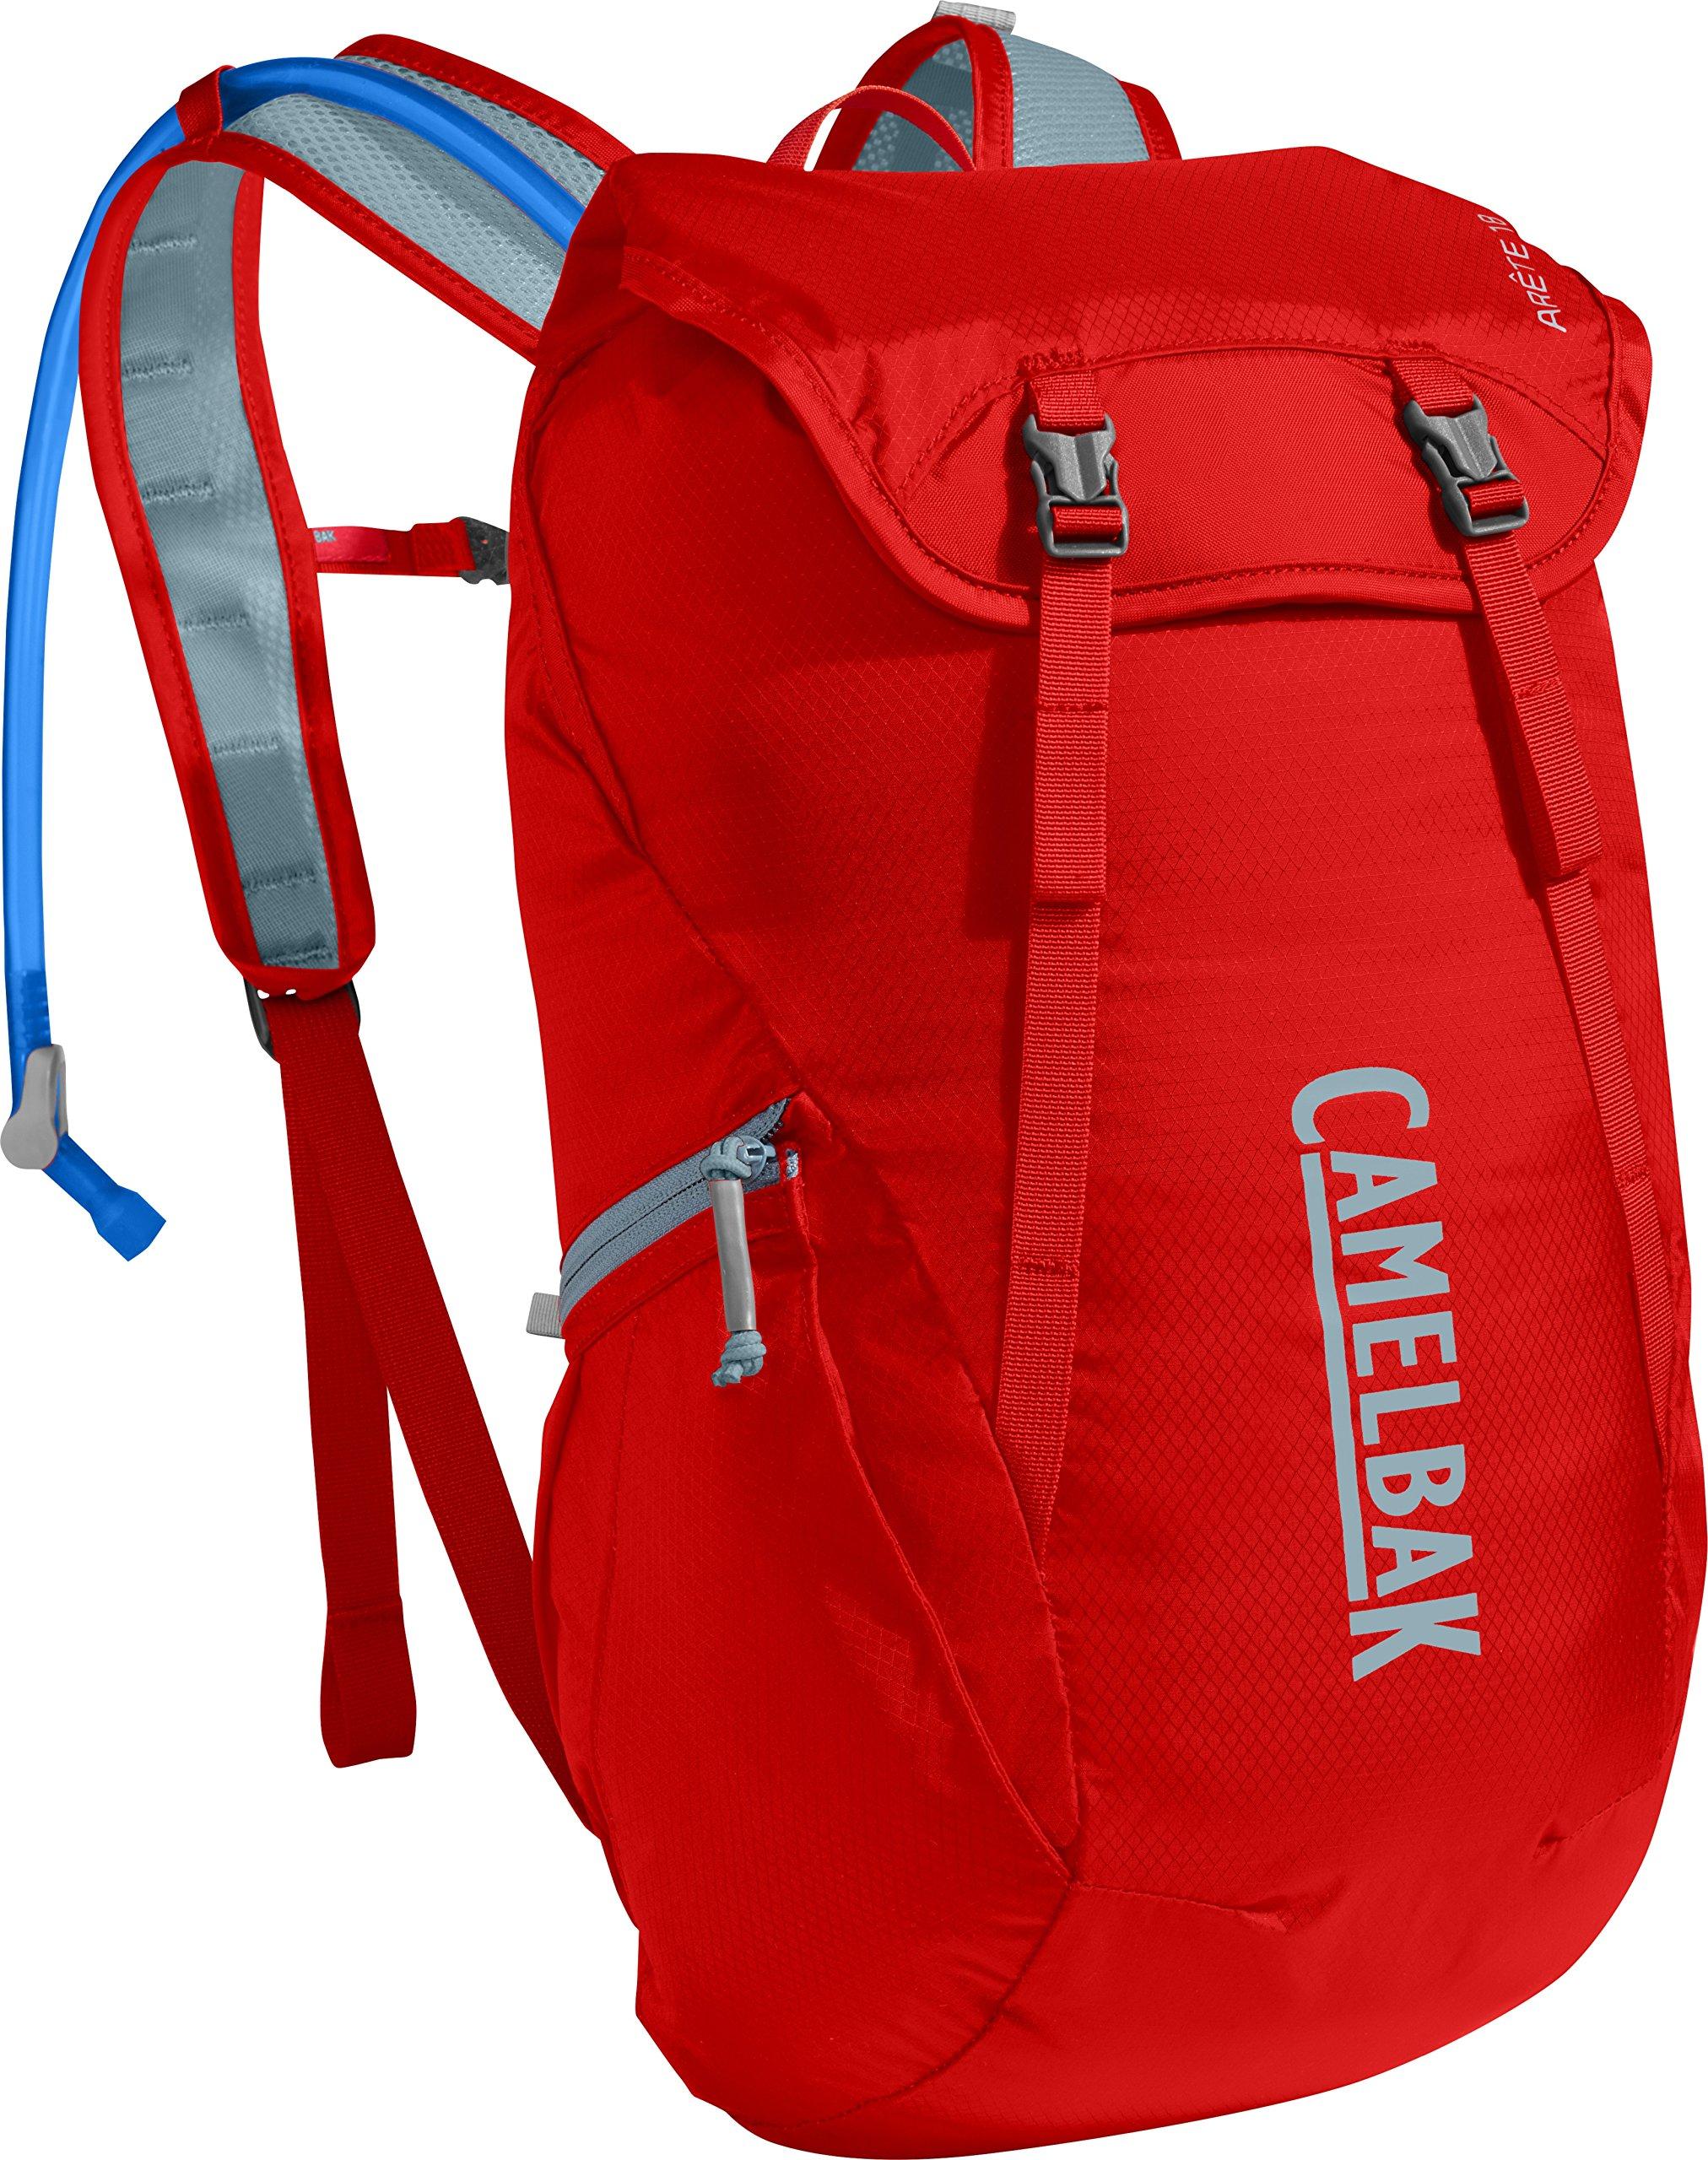 CamelBak Arete 18 Crux Reservoir Hydration Pack, Fiery Red/Stone Blue, 1.5 L/50 oz